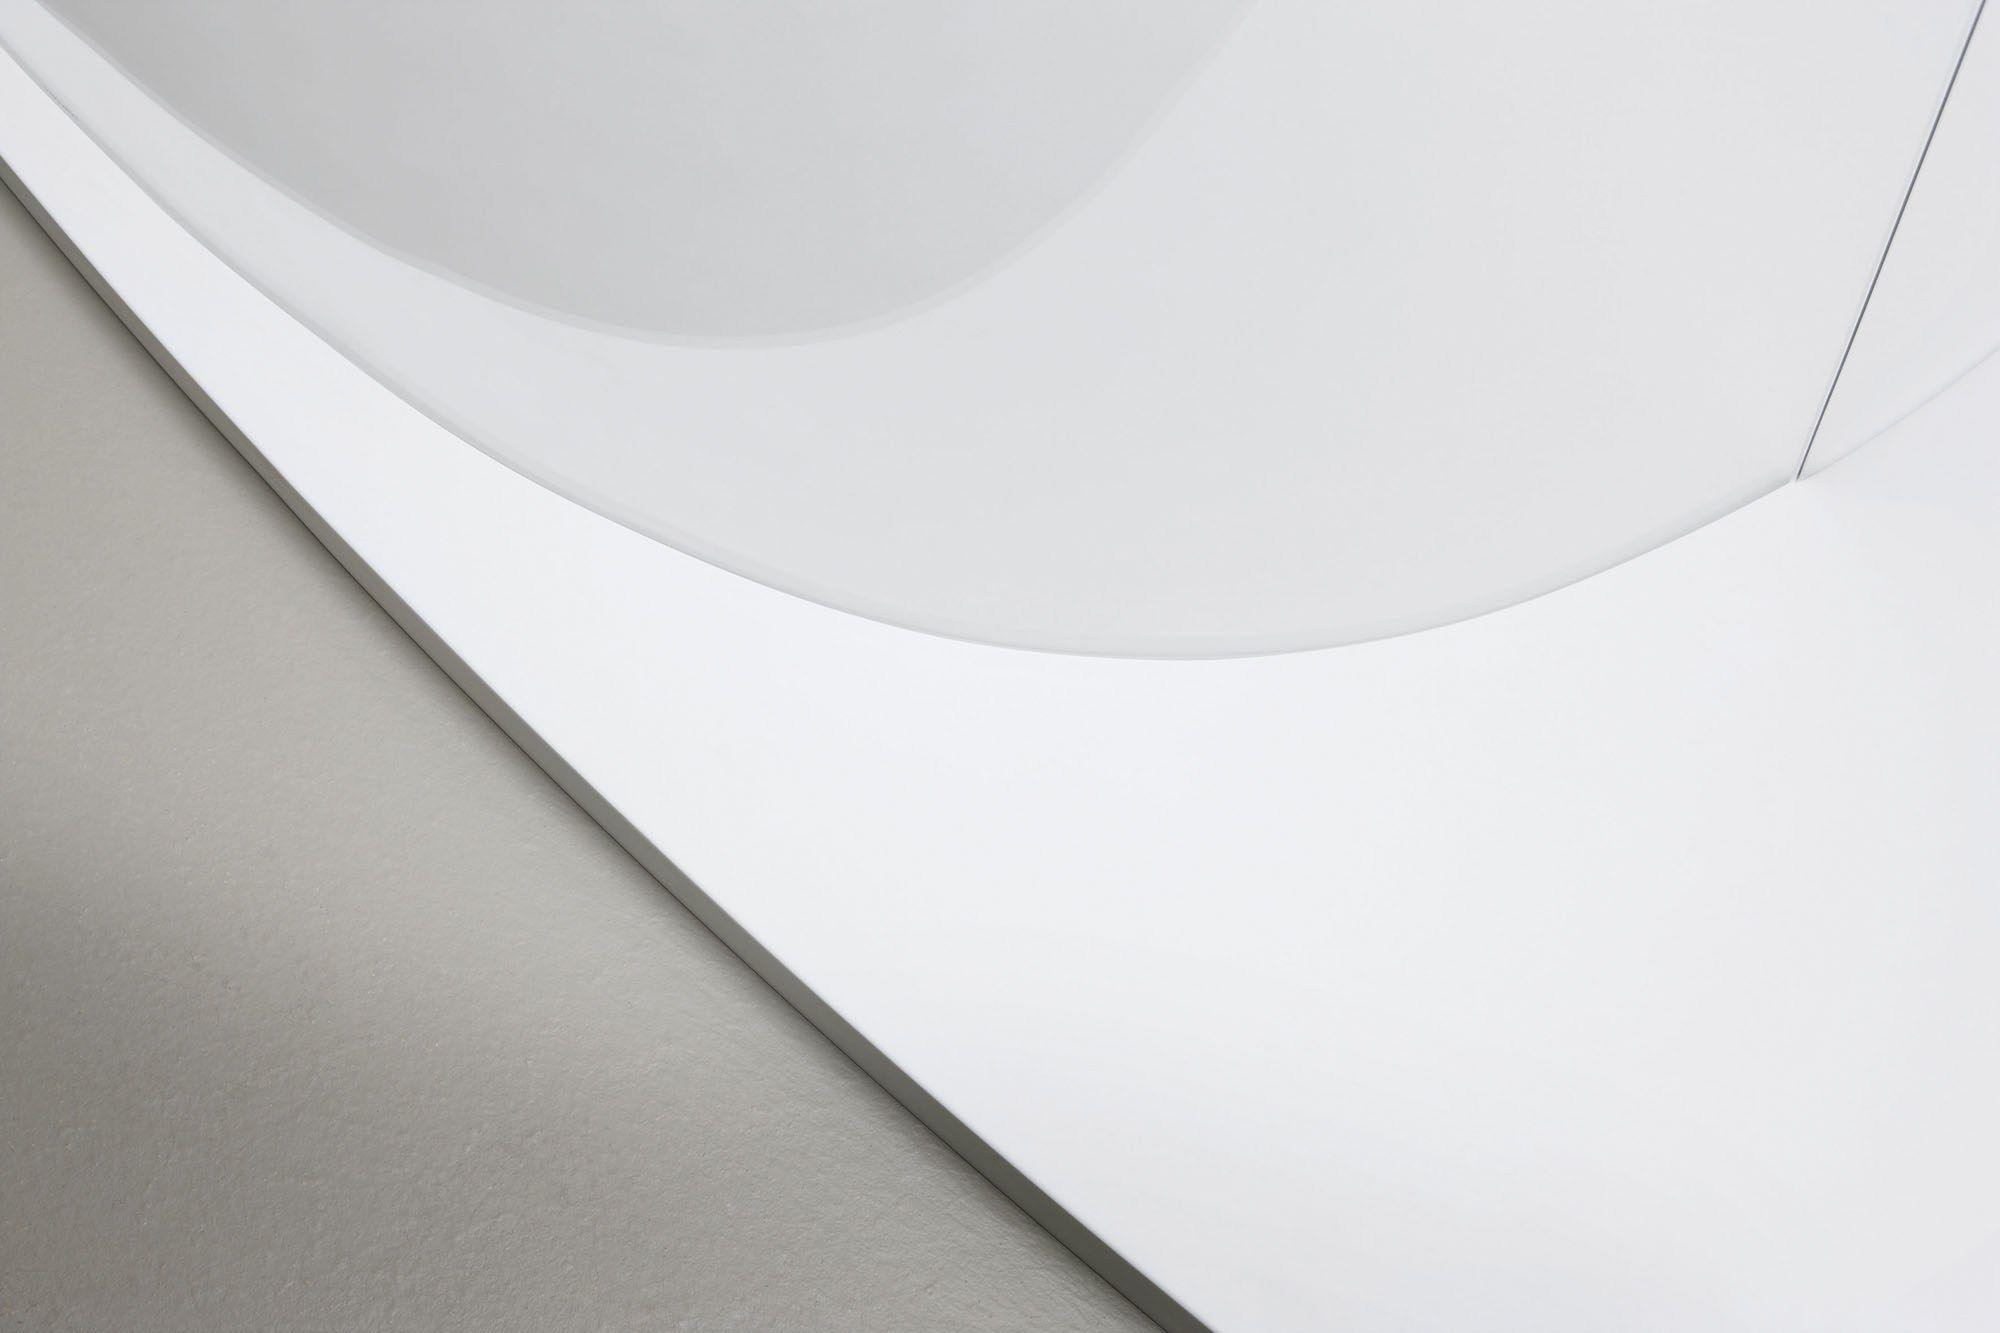 receveur de douche en corian design collection fonte by. Black Bedroom Furniture Sets. Home Design Ideas